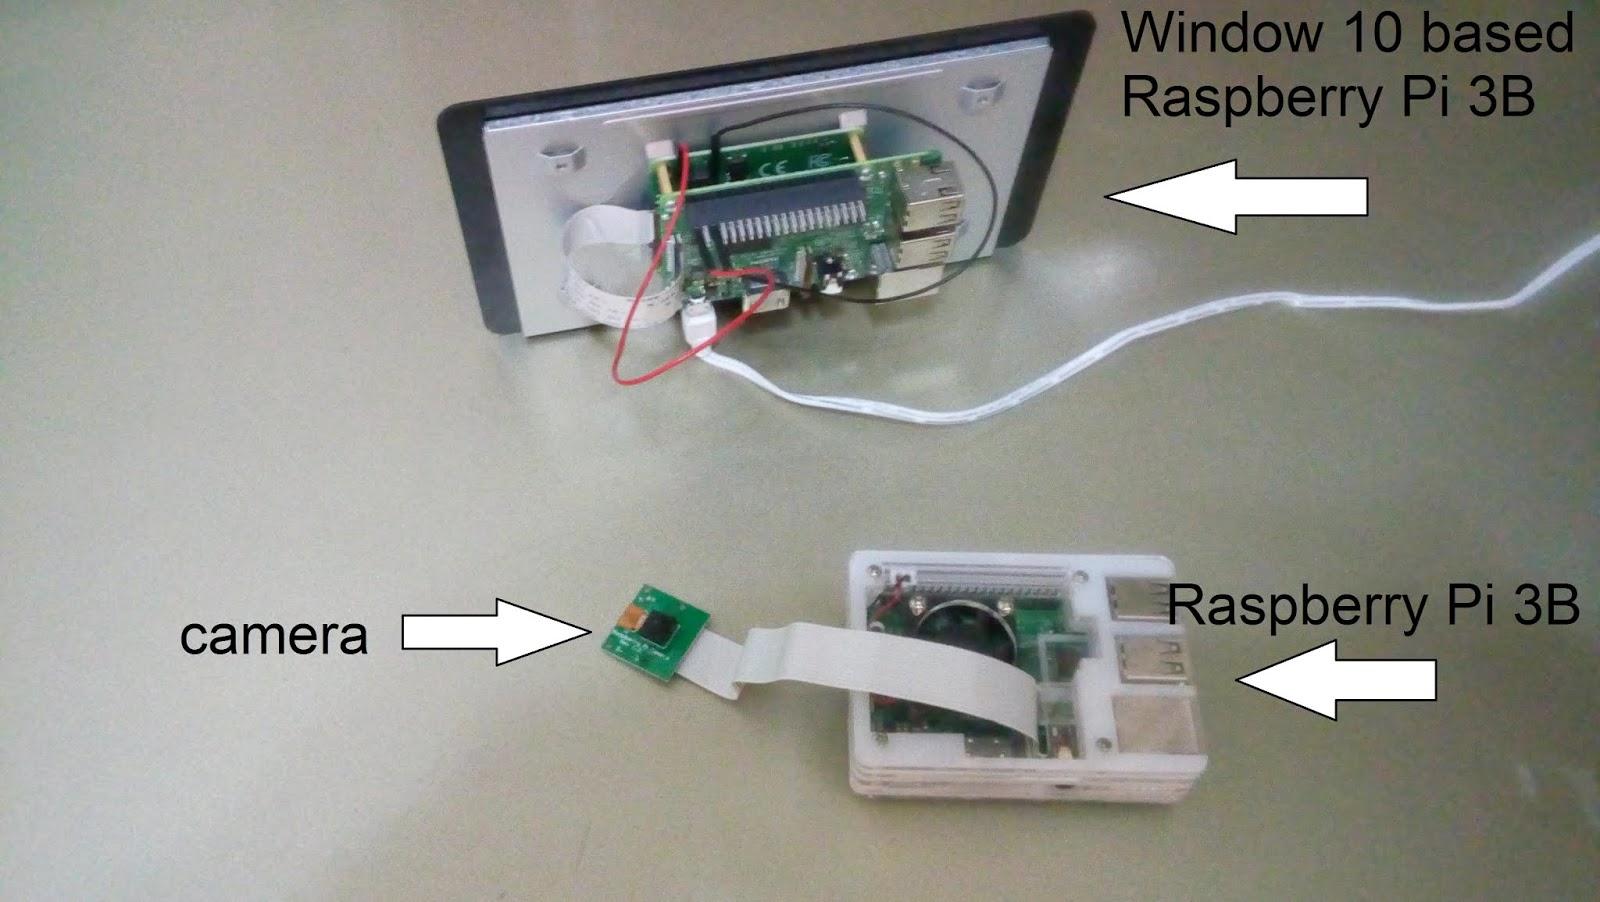 Window 10 based Raspberry Pi + video streaming